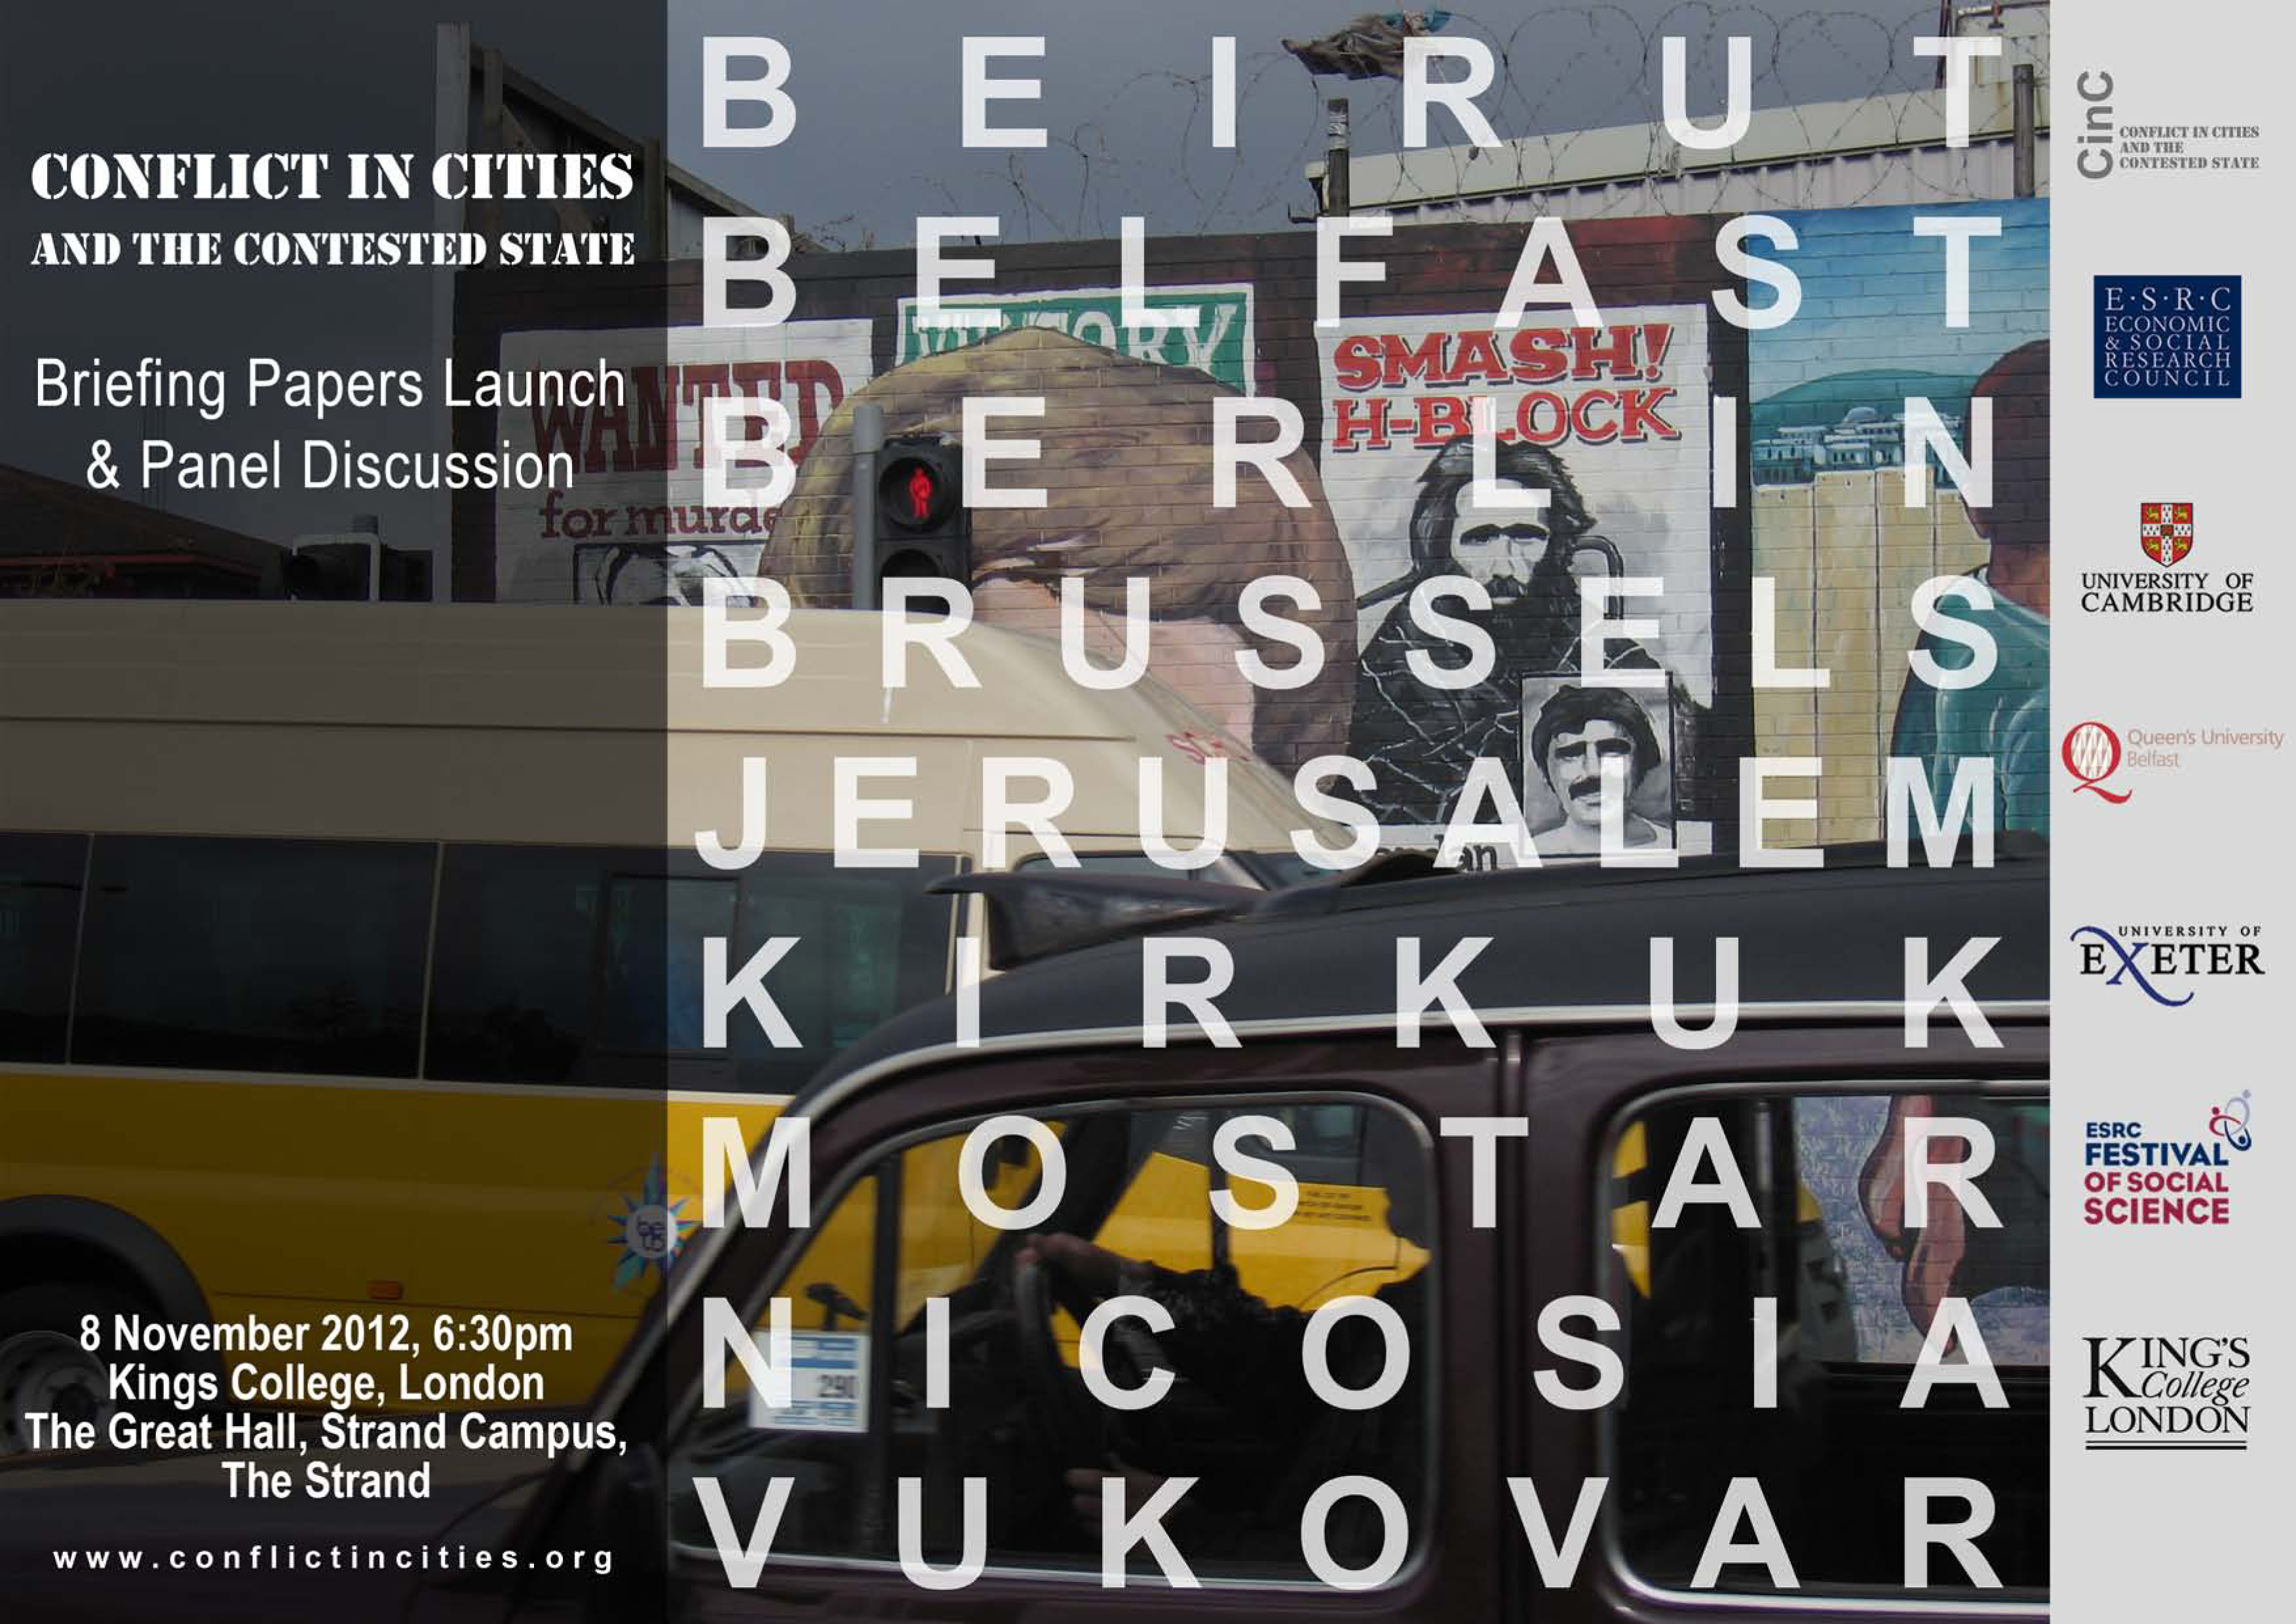 Conflict in Cities Exhib poster